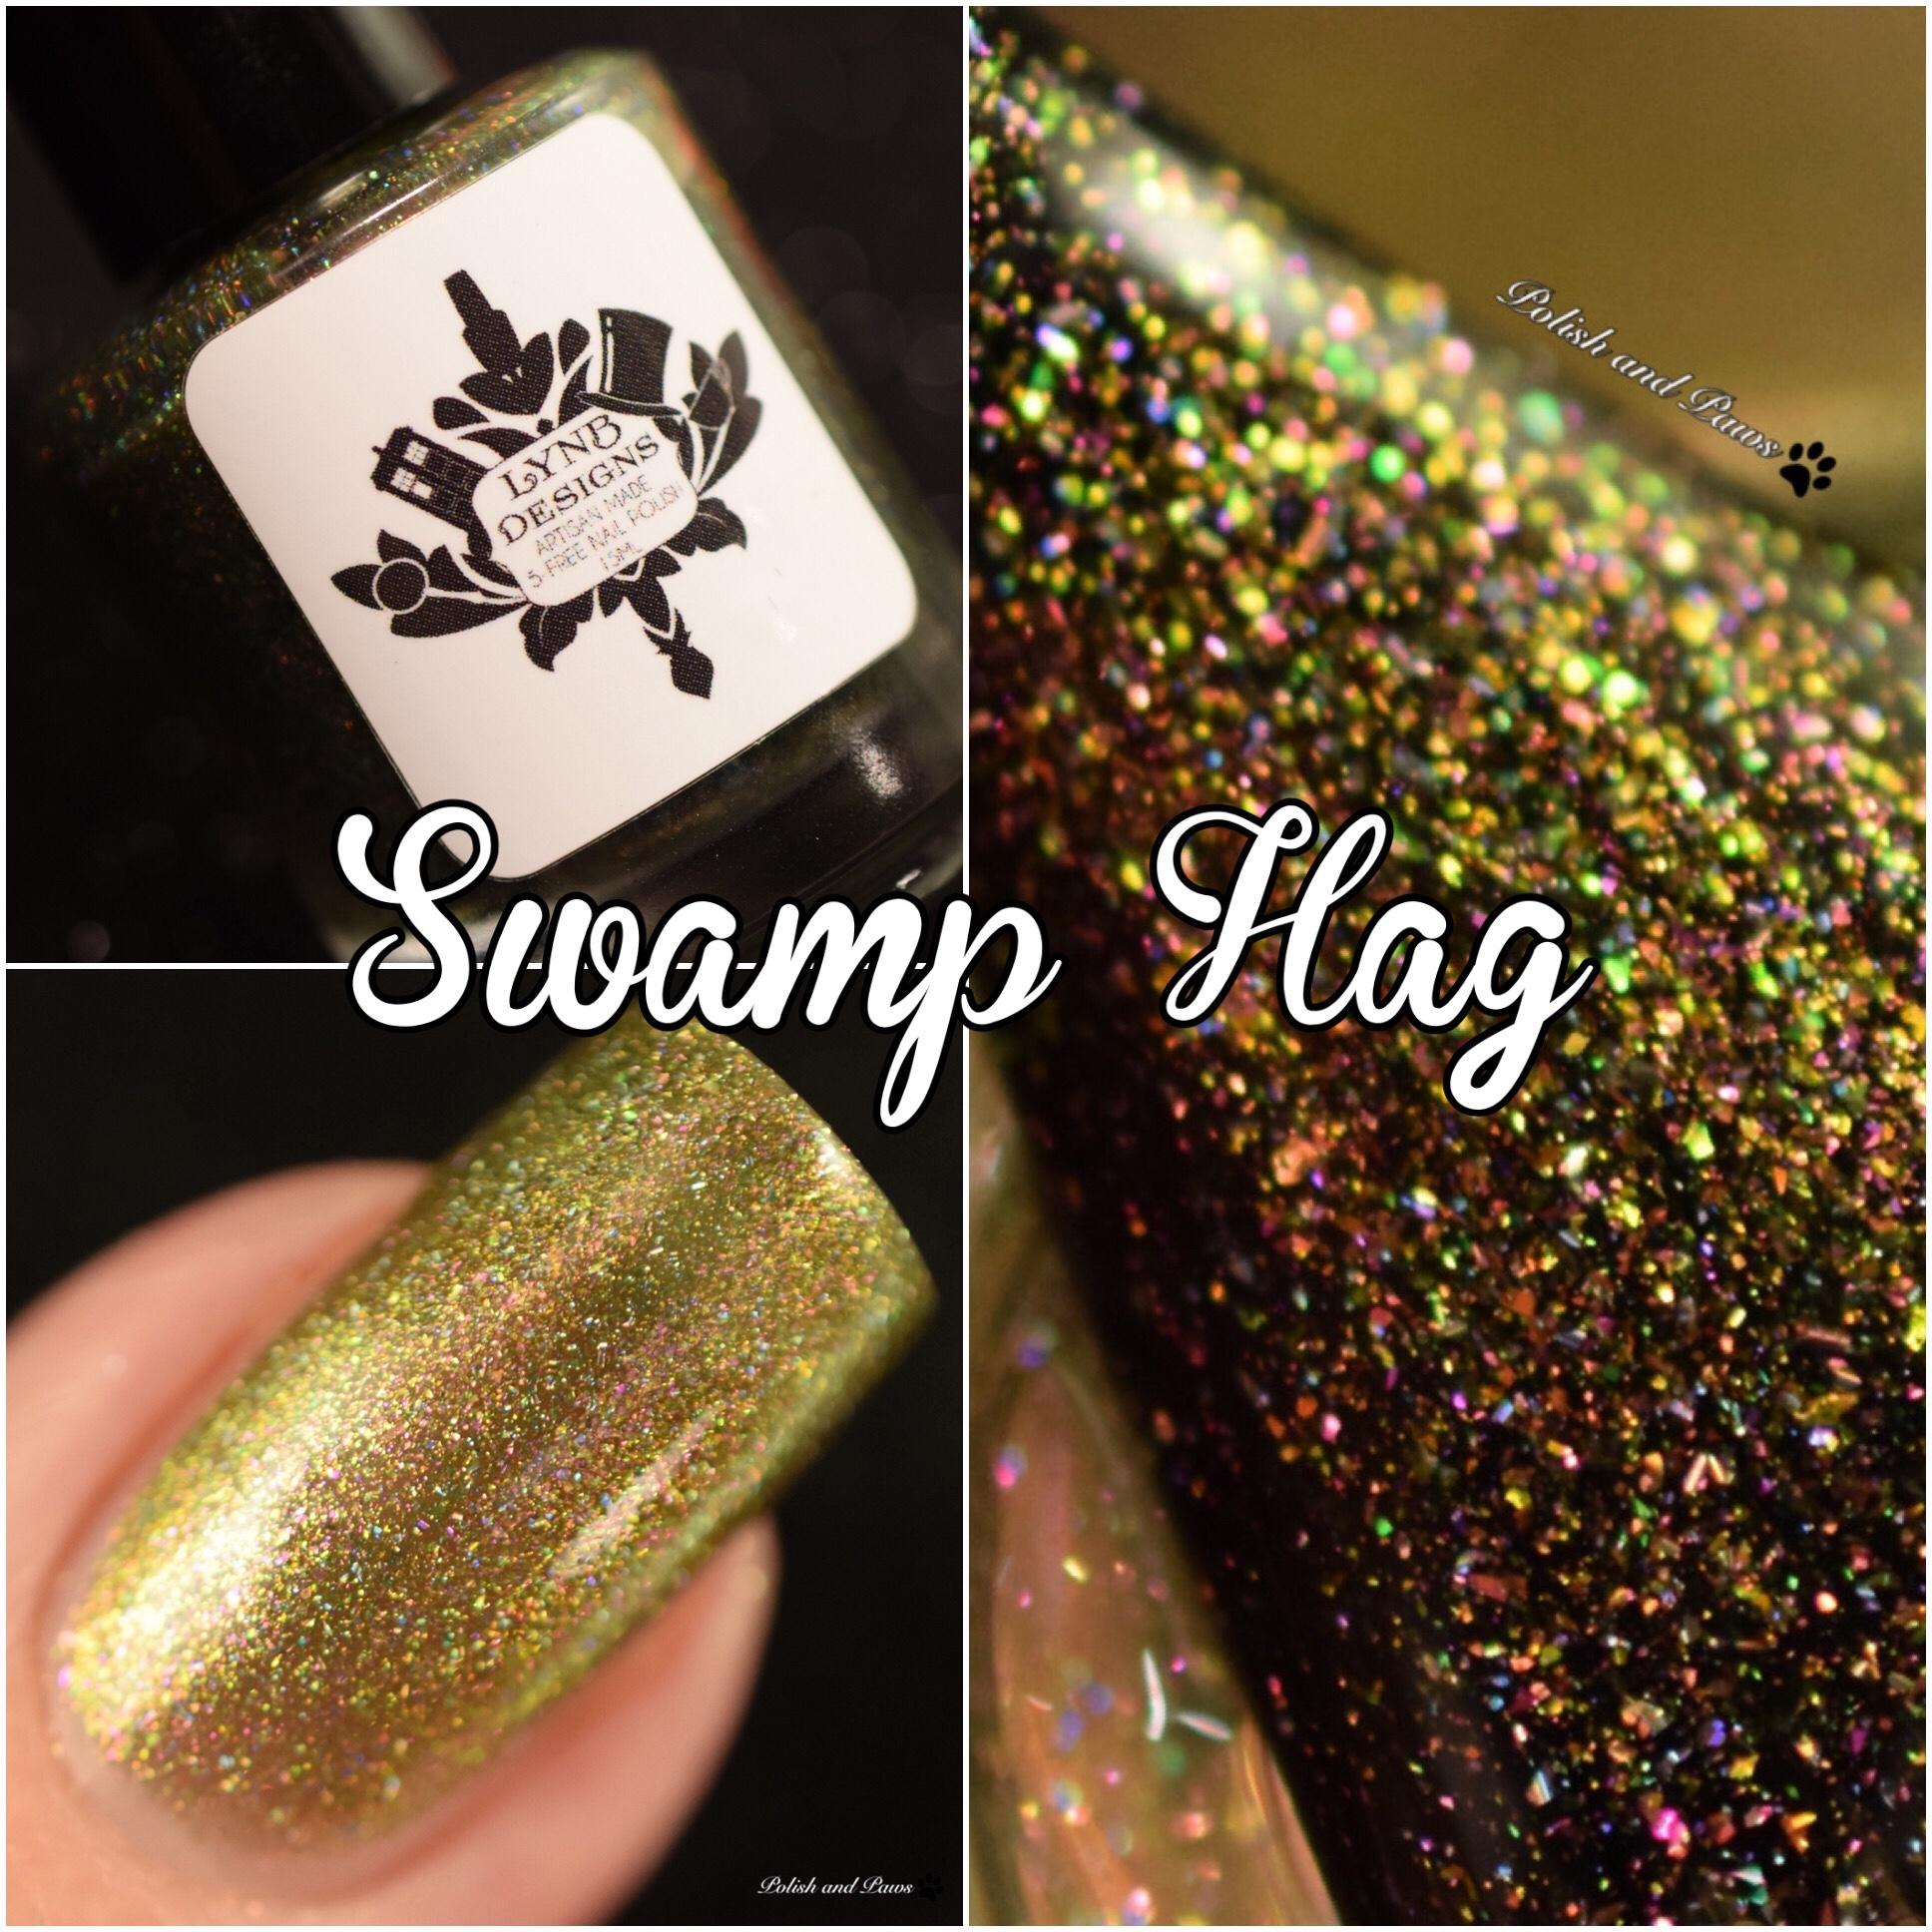 LynB Designs Swamp Hag